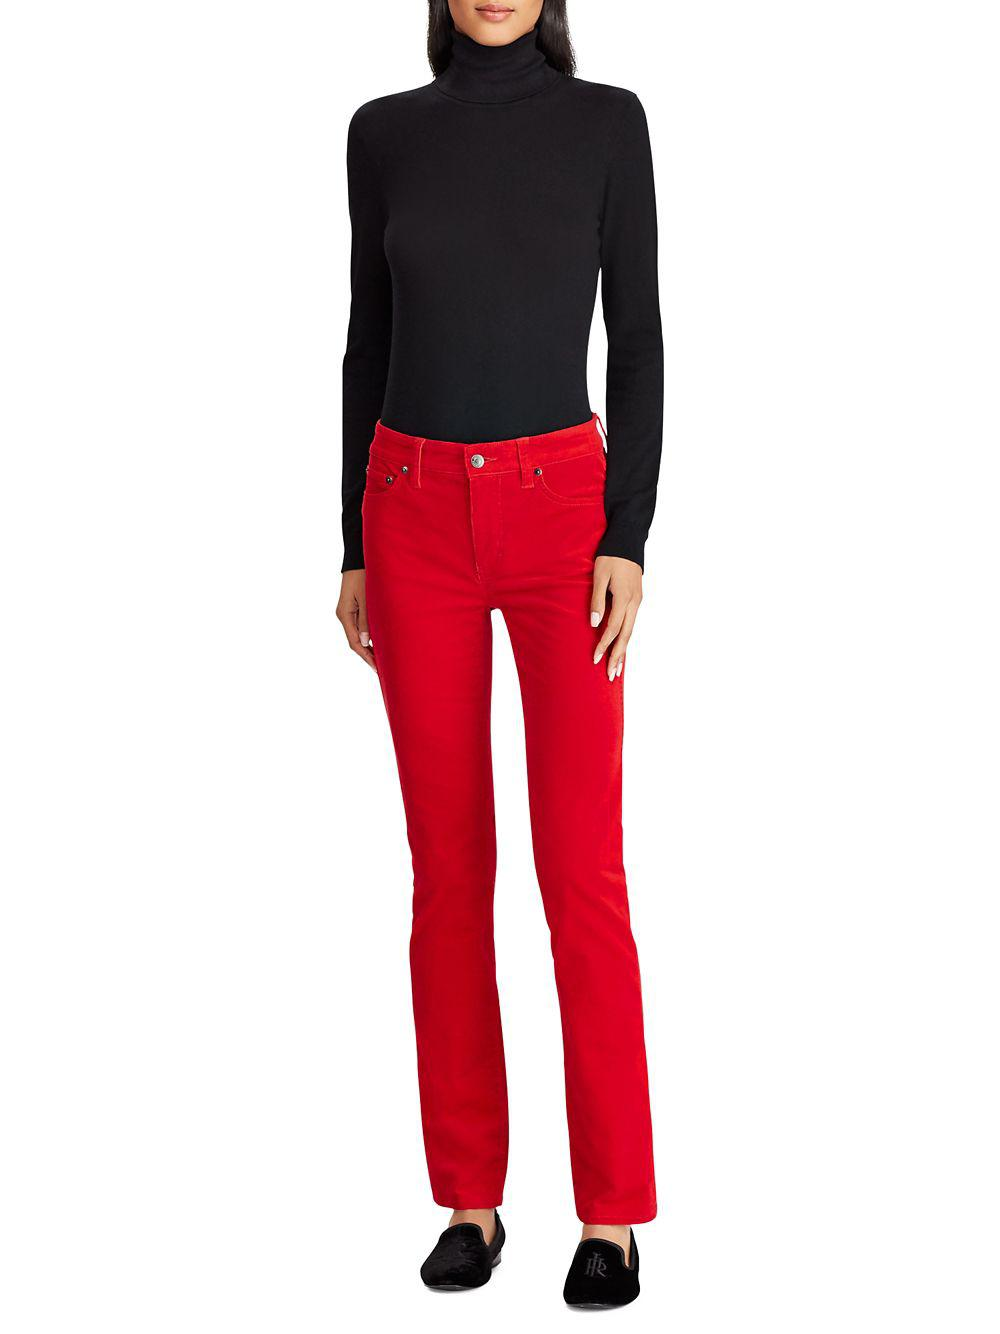 6298763ea76bb Lauren by Ralph Lauren - Red Classic Slim-fit Jeans - Lyst. View fullscreen